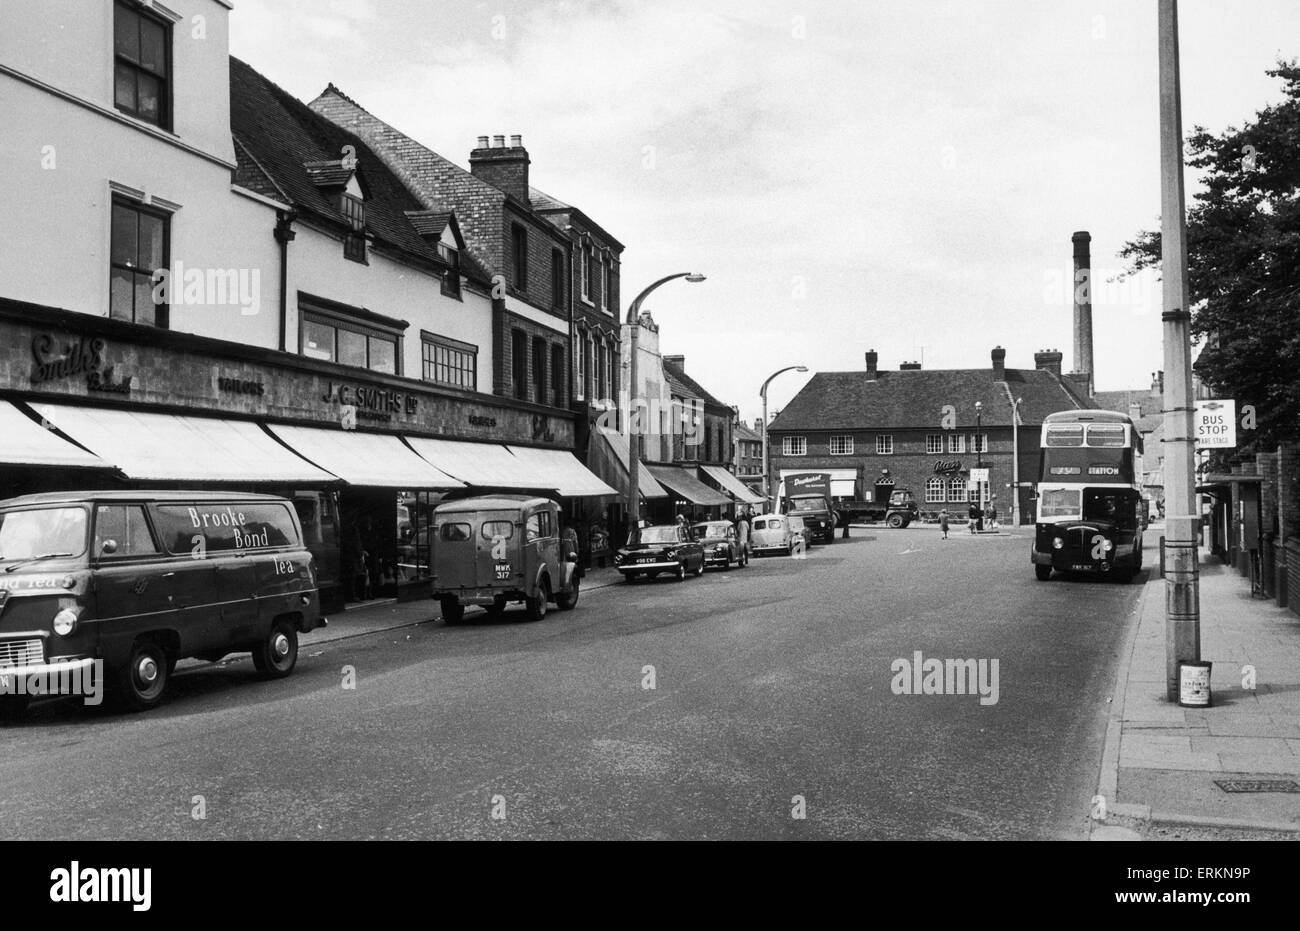 J C Smiths in Market Street Bedwort. 6th August 1966 - Stock Image